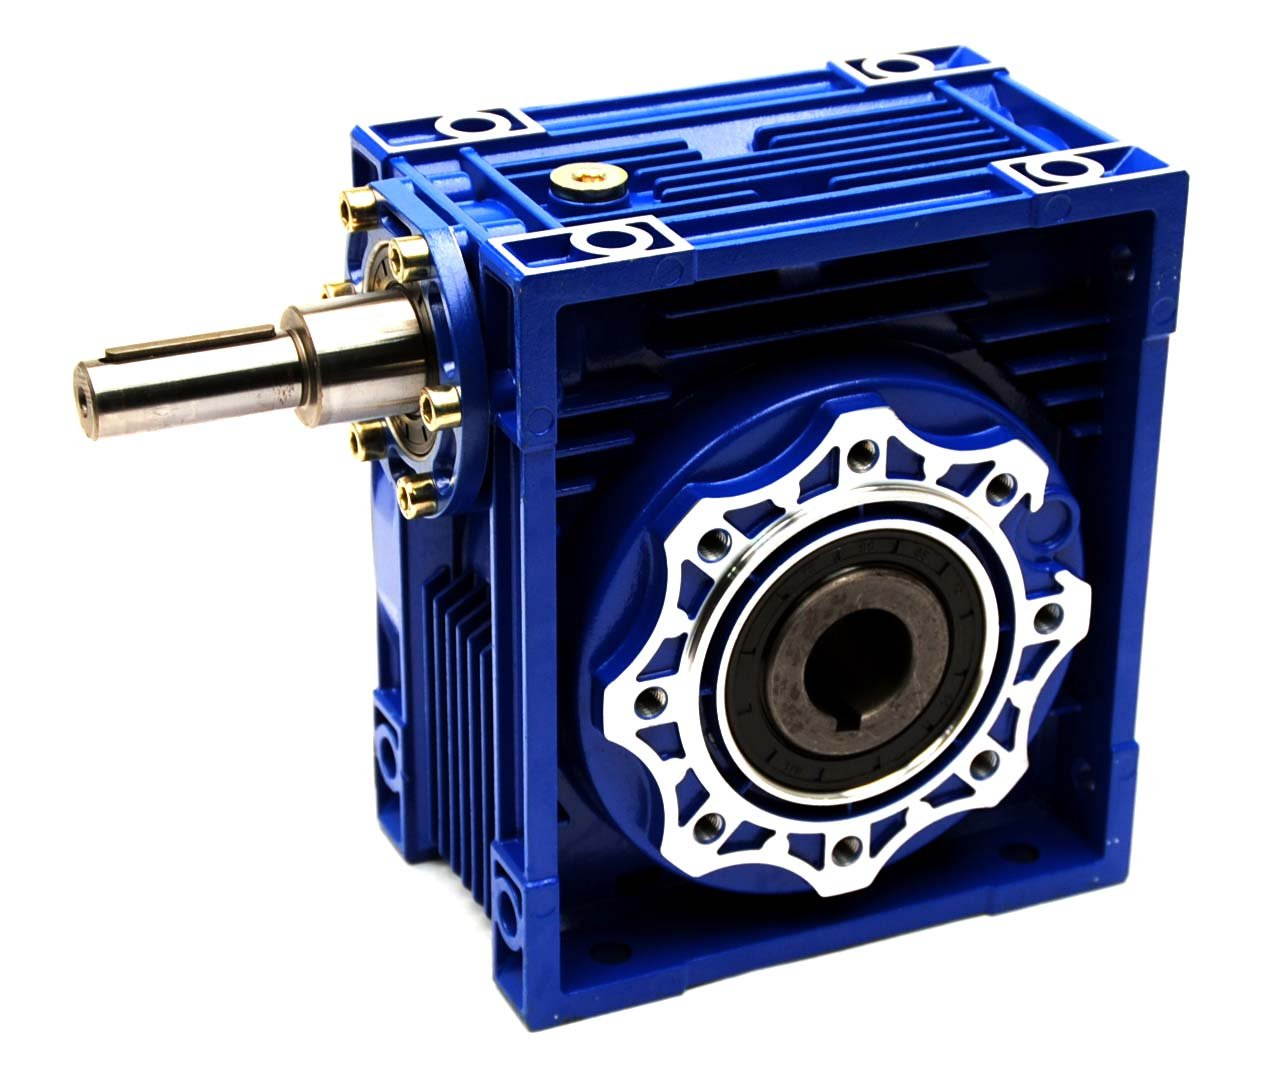 Lexar Industrial RV050 Worm Gear 100:1 Coupled Input Speed Reducer